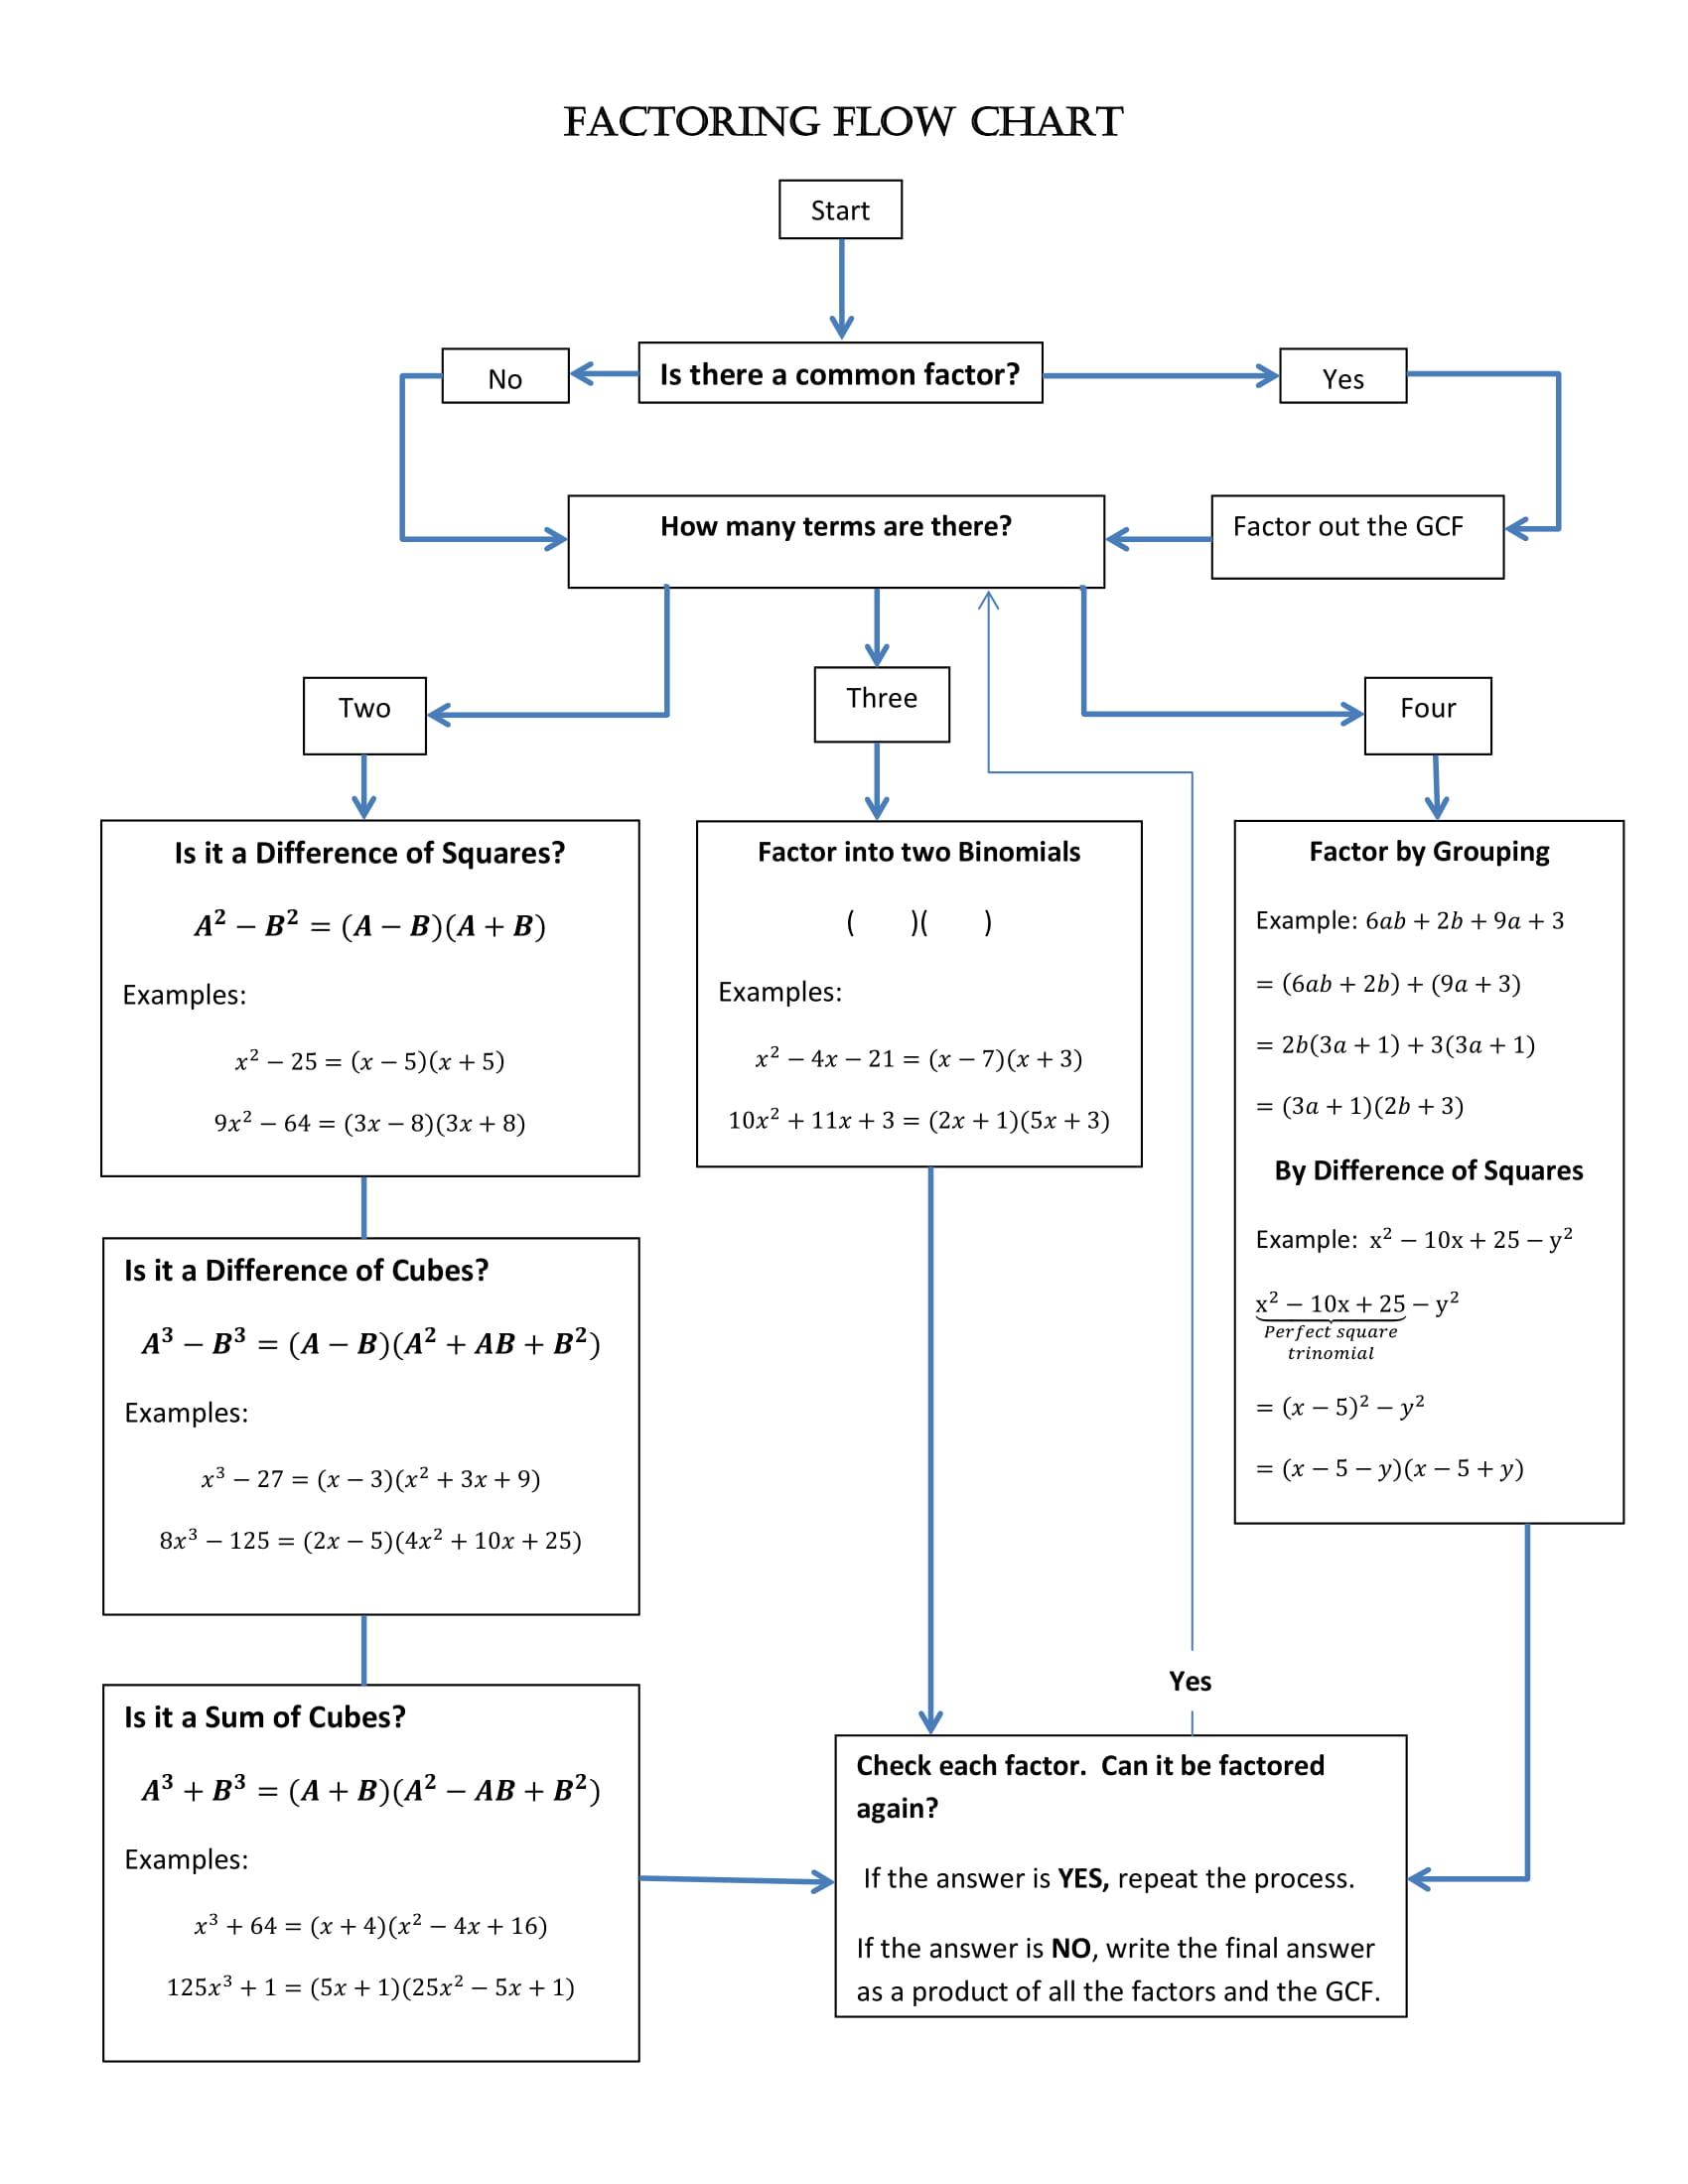 Factoring Flow Chart Example